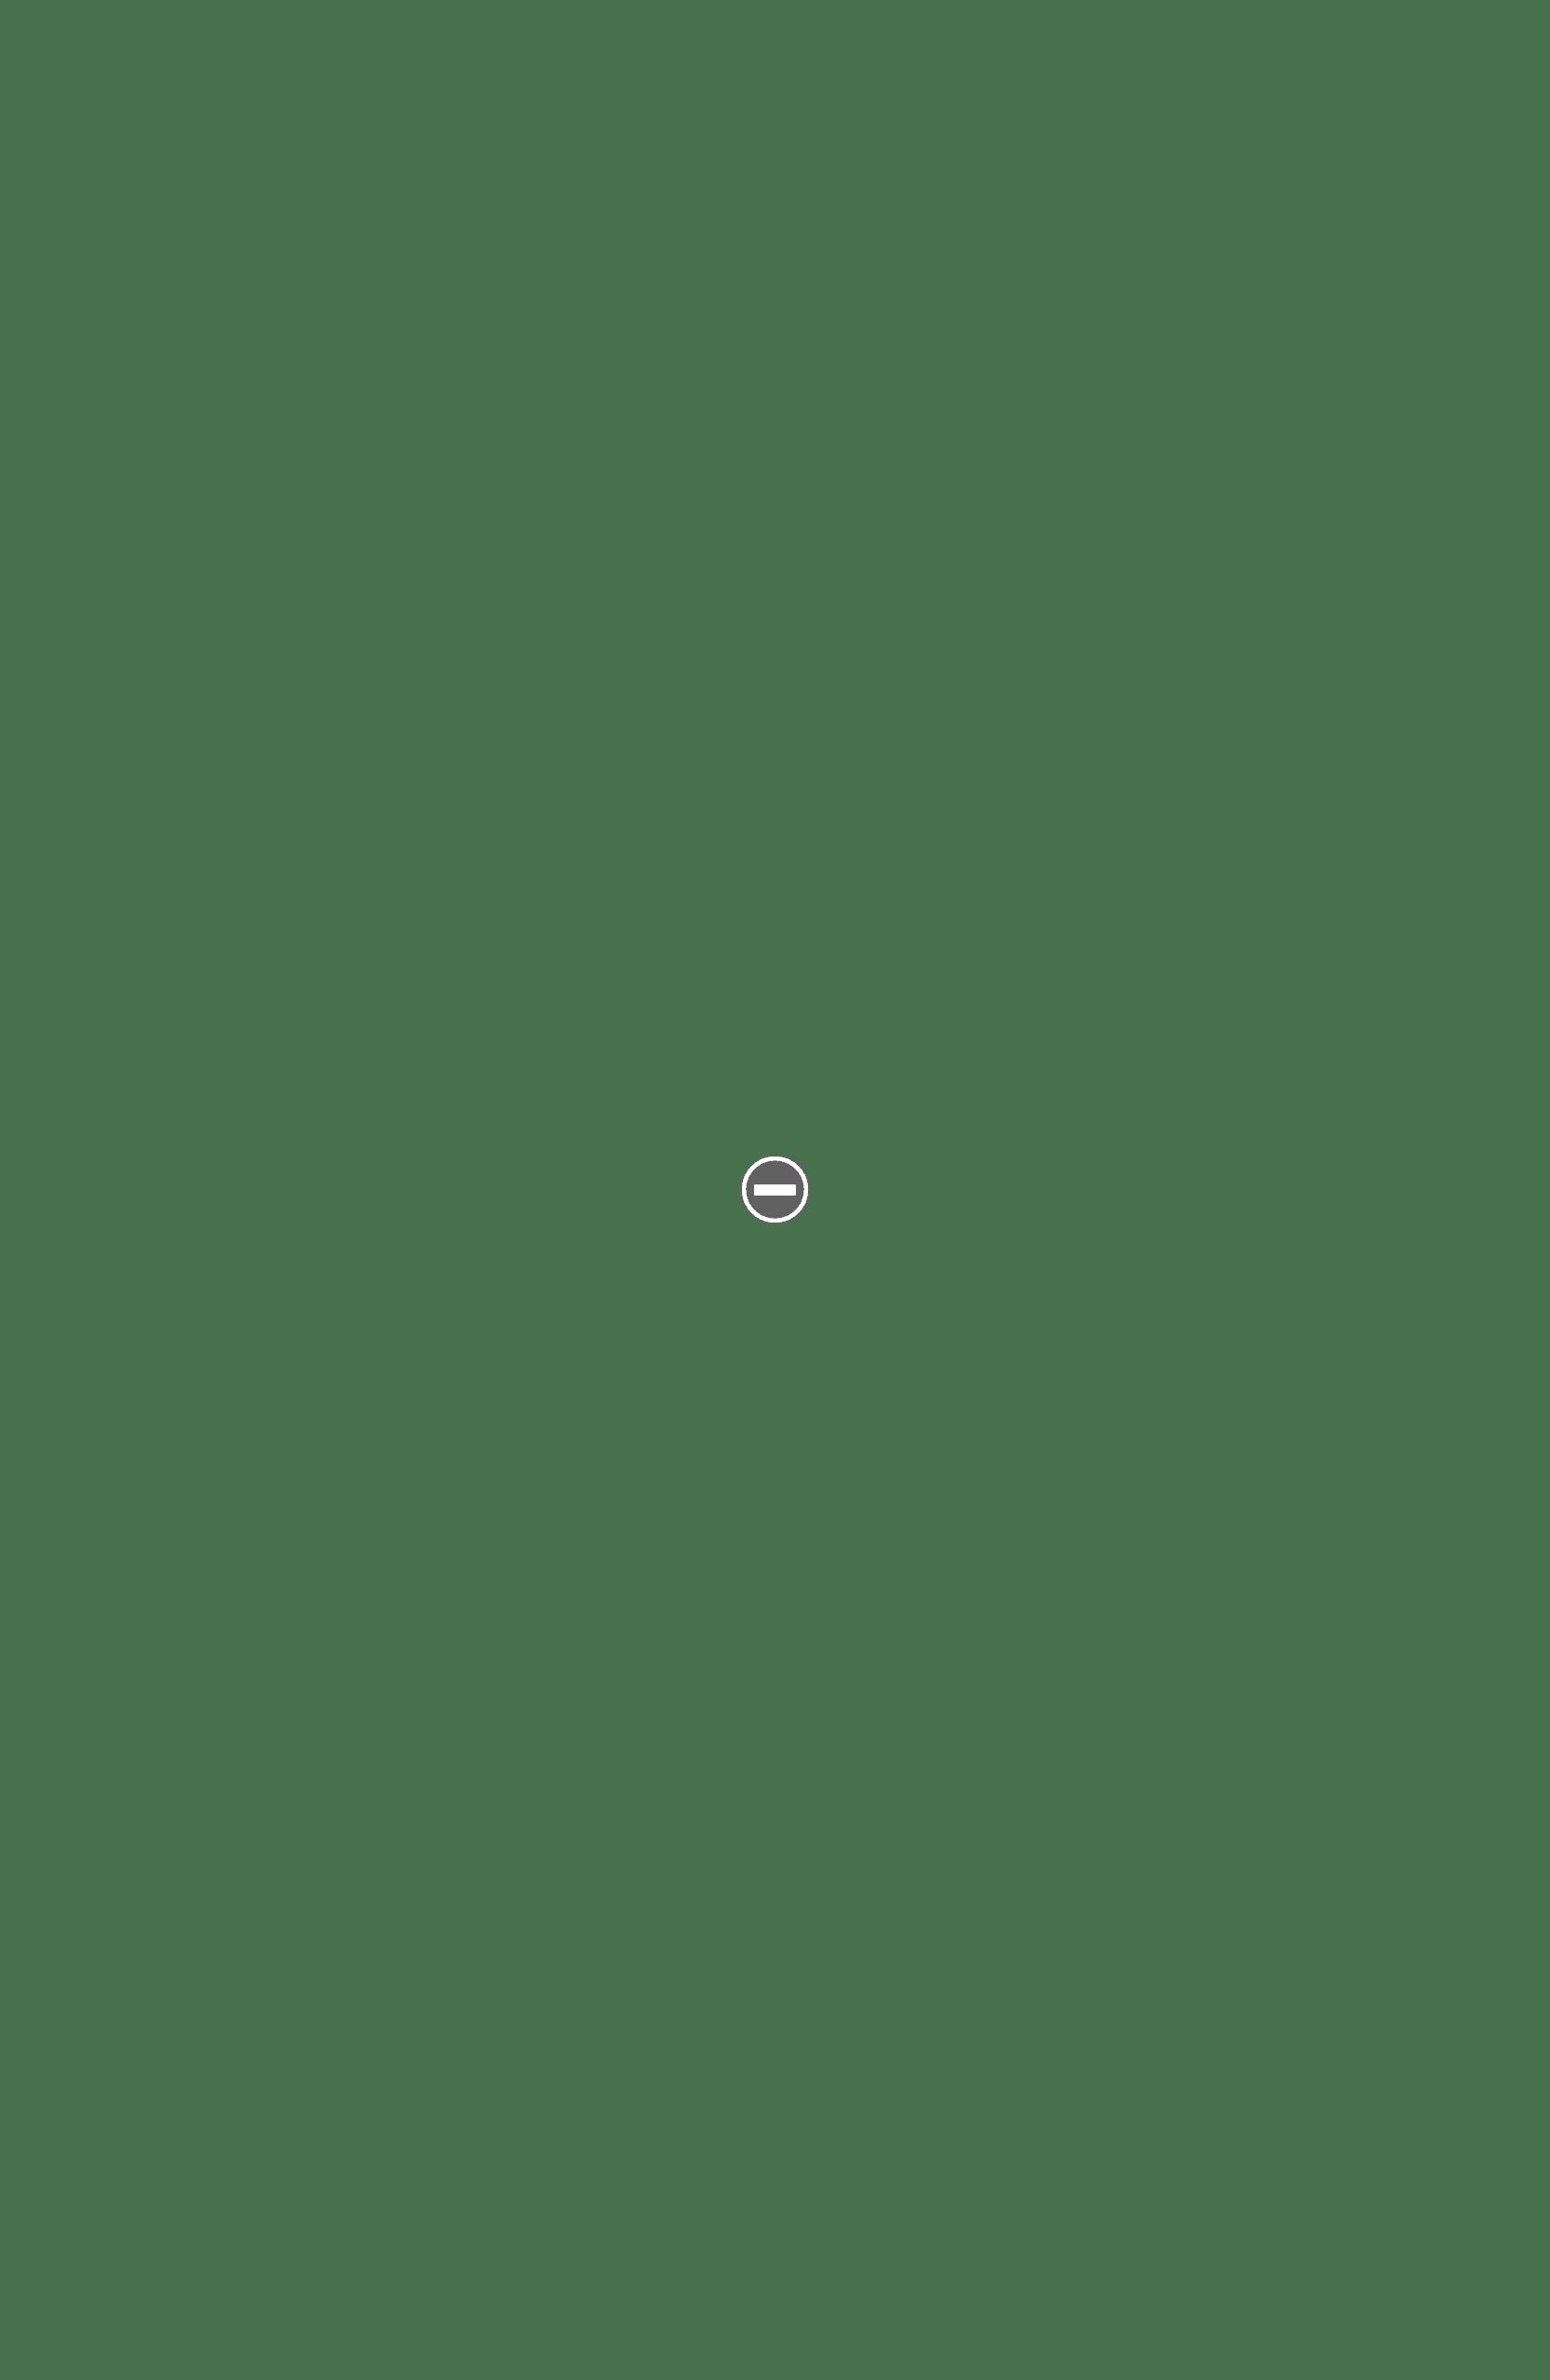 Thor - Gott des Donners (2013) - komplett